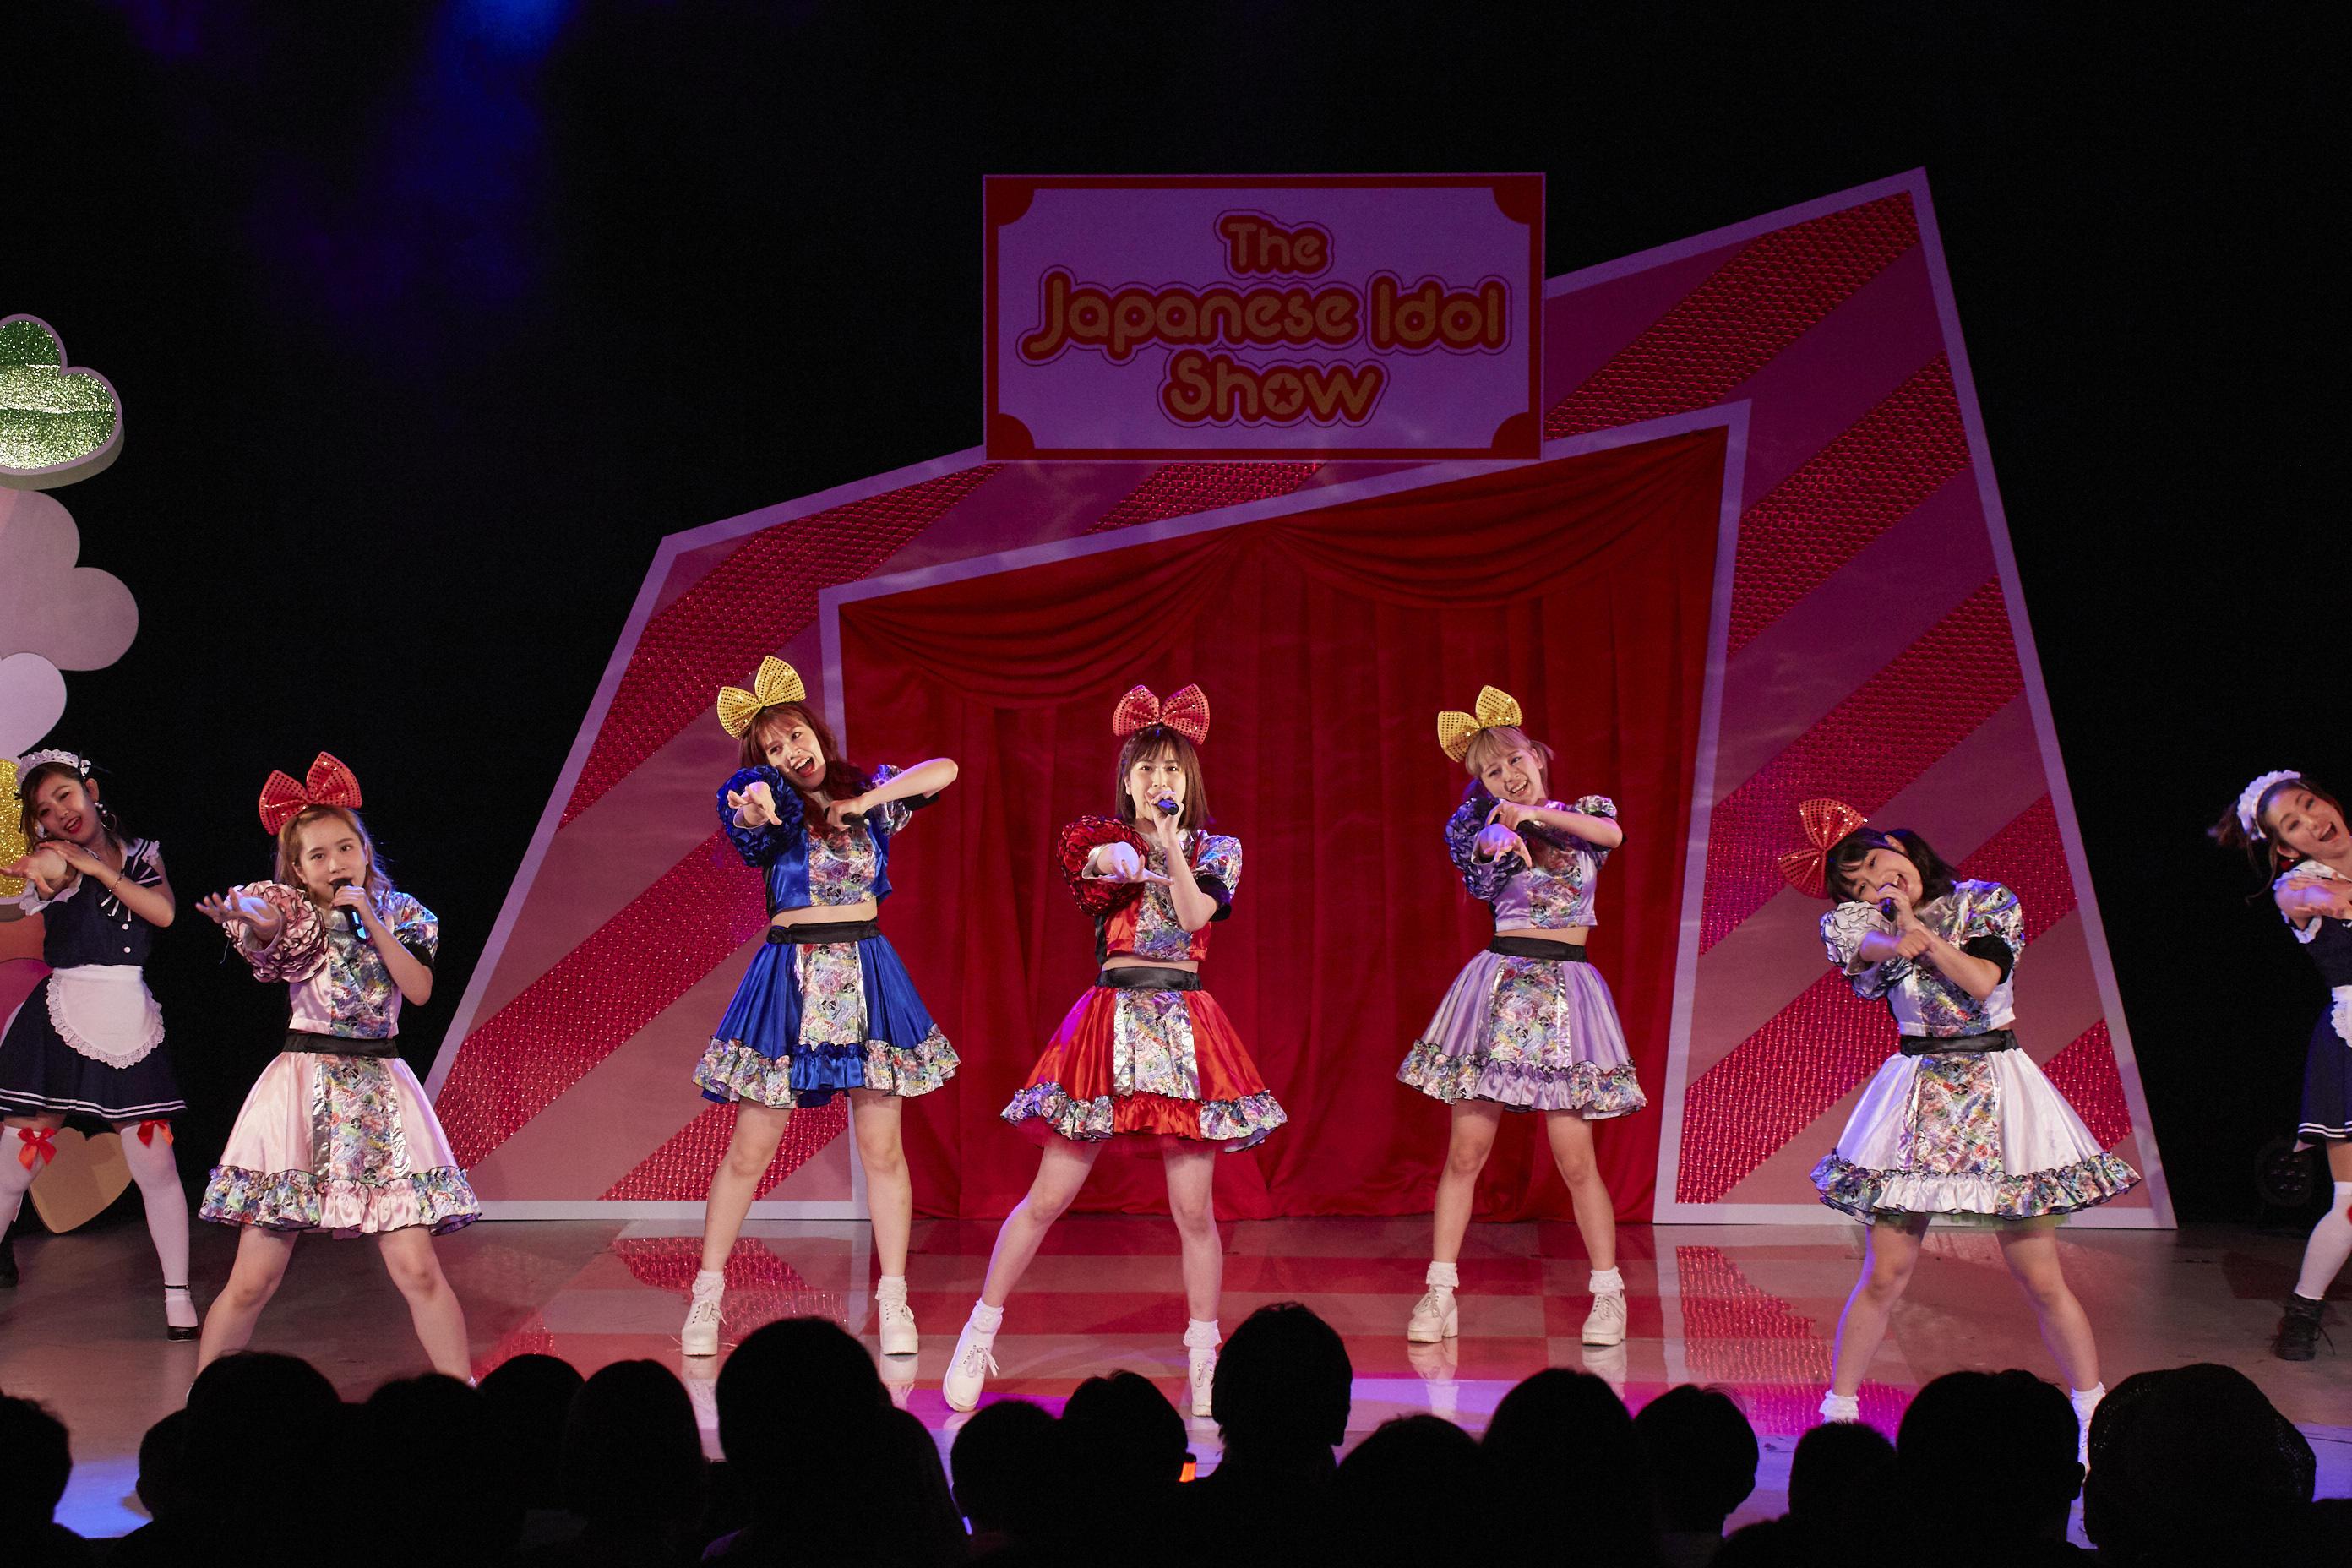 http://news.yoshimoto.co.jp/20180704093903-68932e5294100d26829cce82e92551bd8f58f27e.jpg